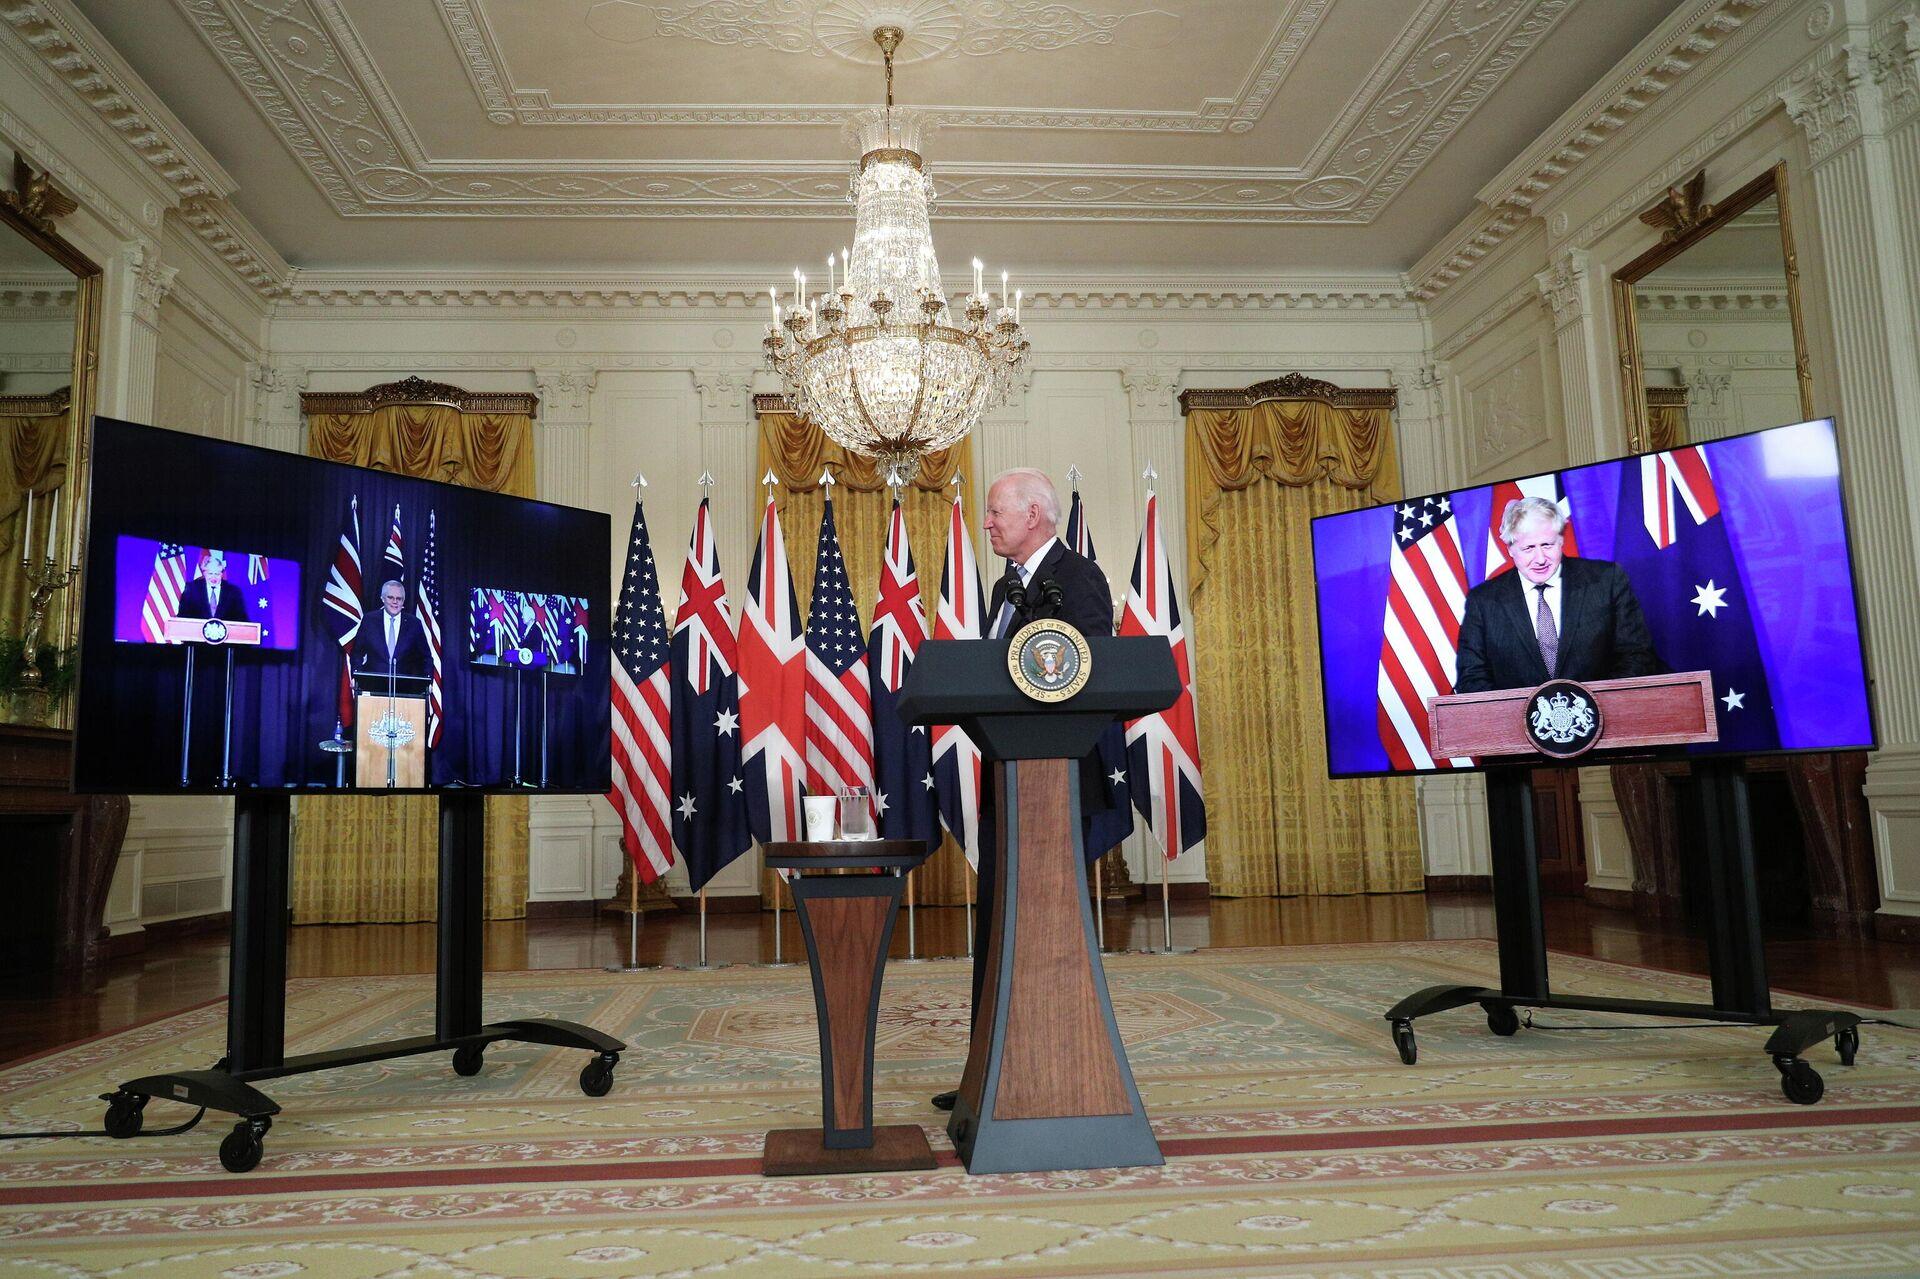 U.S. President Joe Biden delivers remarks on a National Security Initiative virtually with Australian Prime Minister Scott Morrison and British Prime Minister Boris Johnson, inside the East Room at the White House in Washington, U.S., September 15, 2021 - Sputnik International, 1920, 17.09.2021